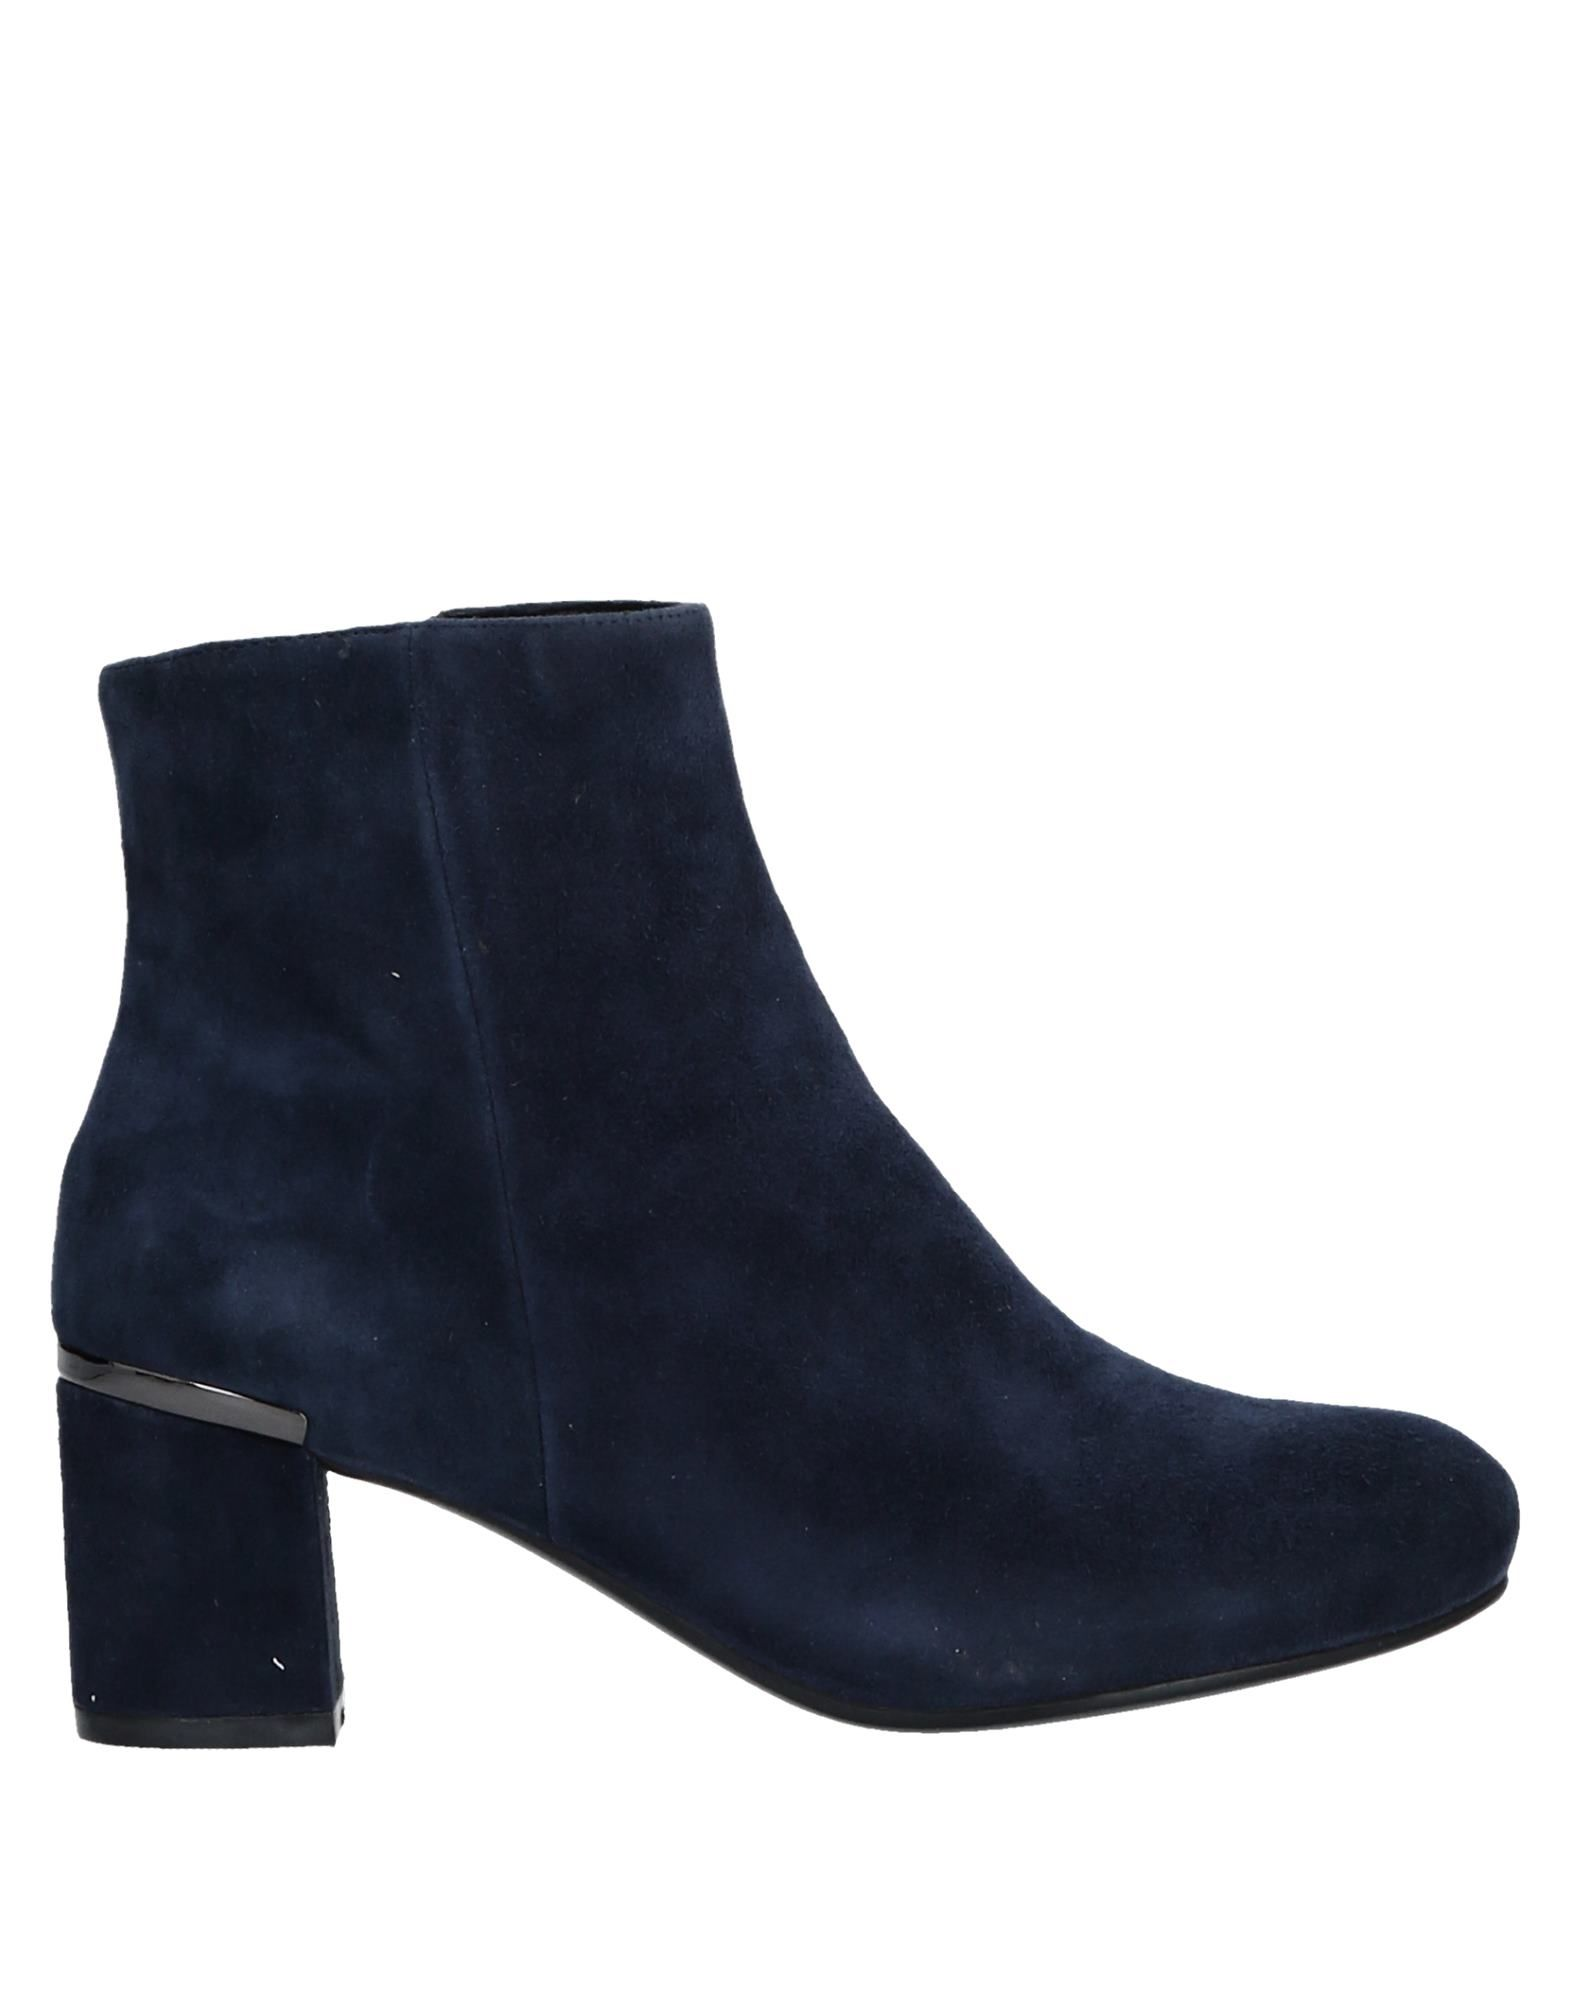 Lola Cruz Ankle Boot - Boots Women Lola Cruz Ankle Boots - online on  Canada - 11265966OA a1dd54